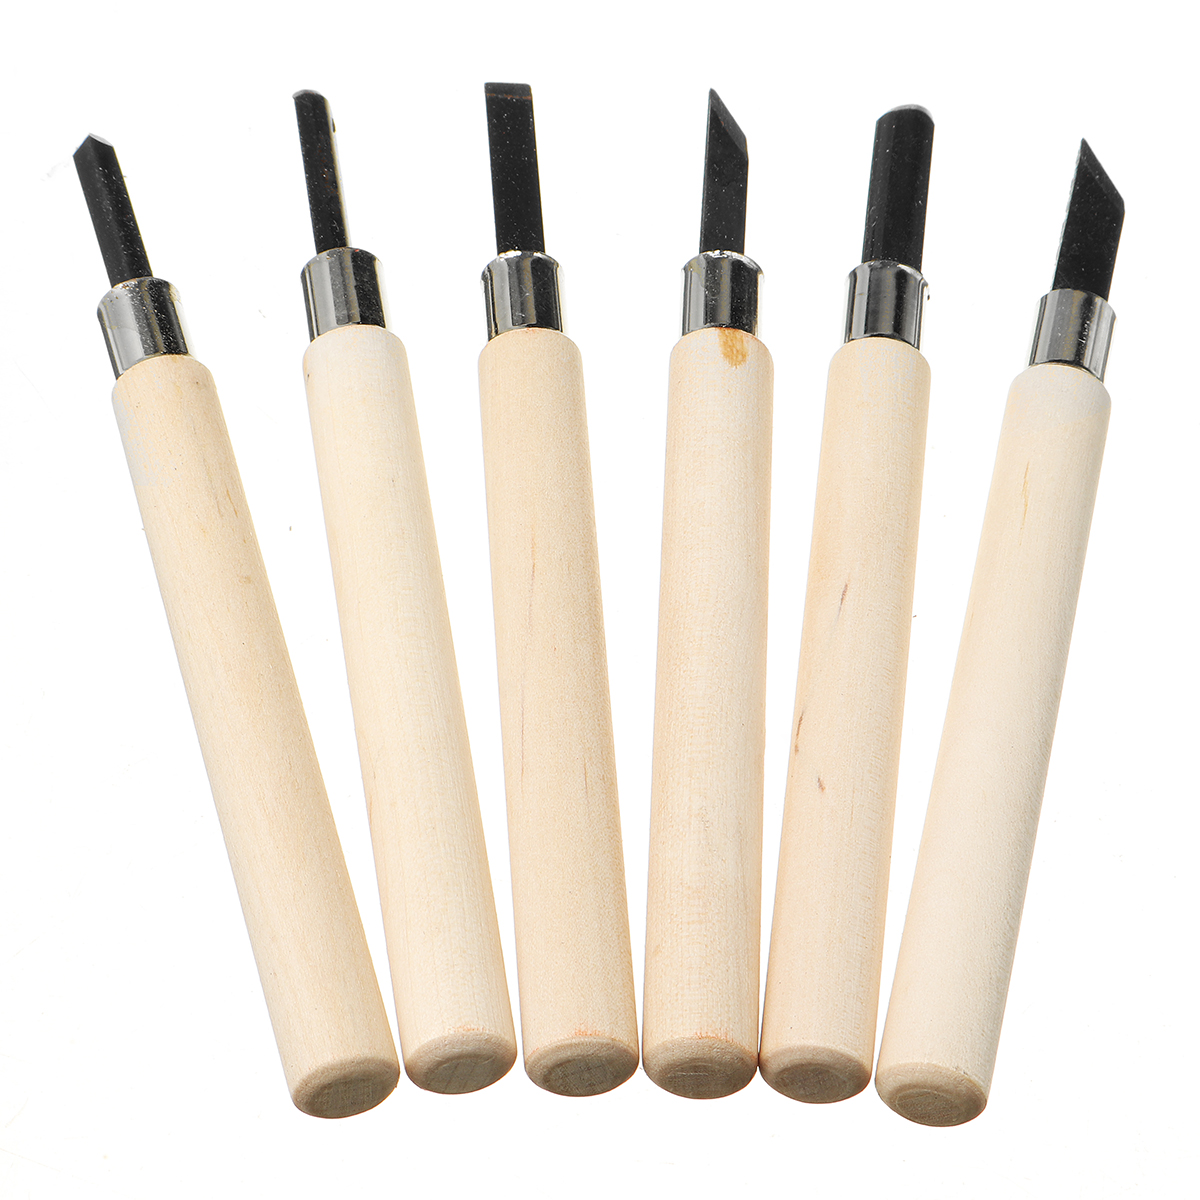 3/4/5/6/8Pcs Wood Carving Tool Chisels Set WoodCarving Kit Woodcut Craft Hand Tools